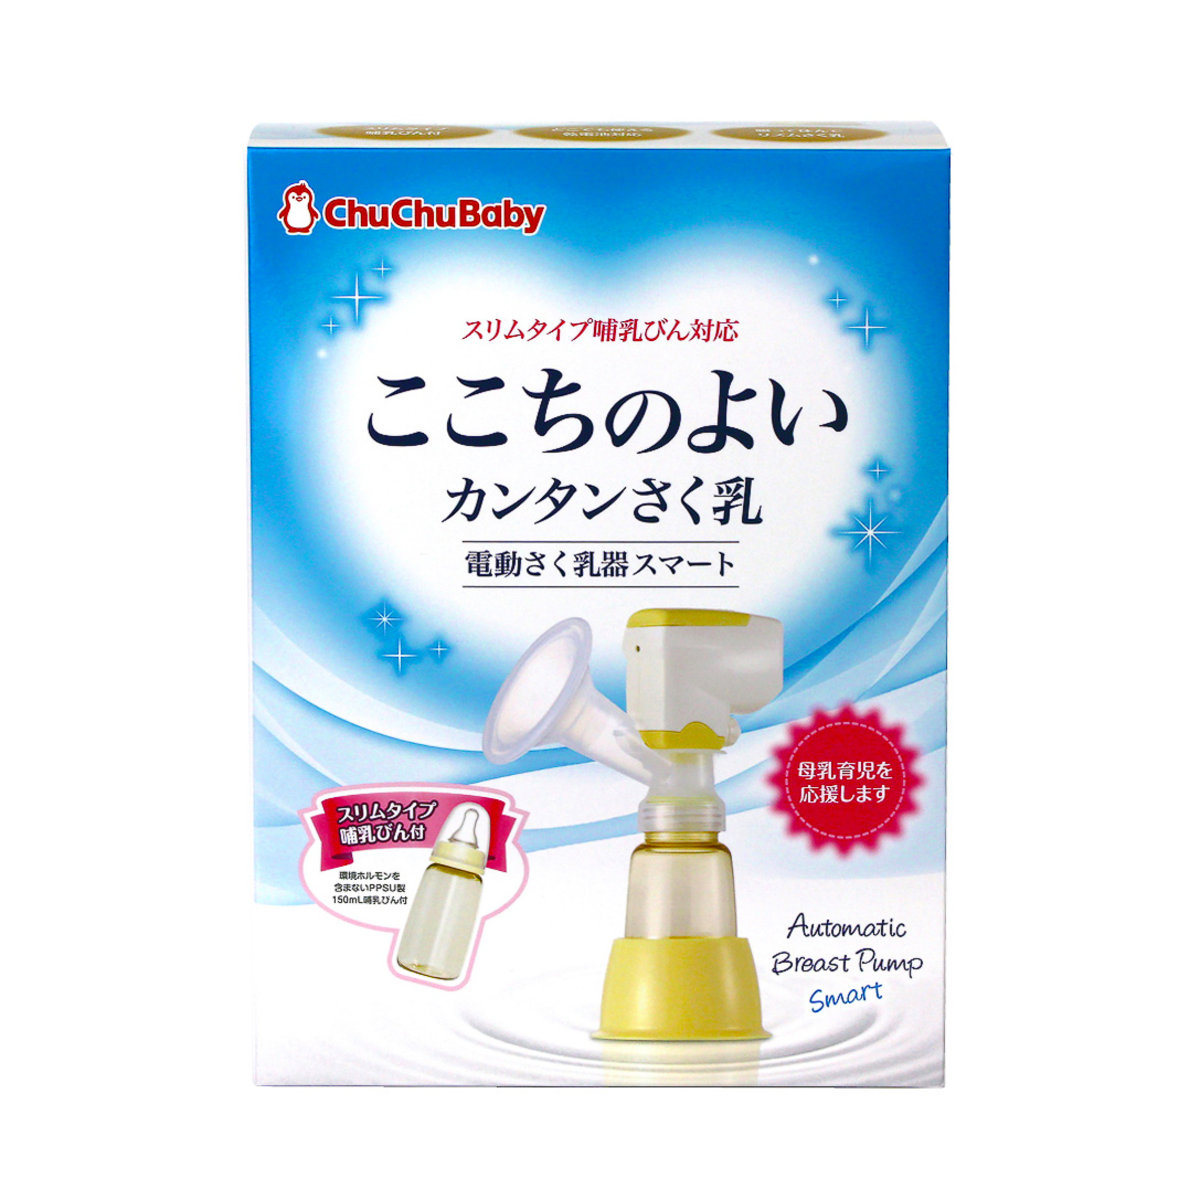 Chuchubaby Feeling Good Electric Breast Pump Hktvmall Online Chuchu Ppsu Baby Feeding Bottle Cool Red 150